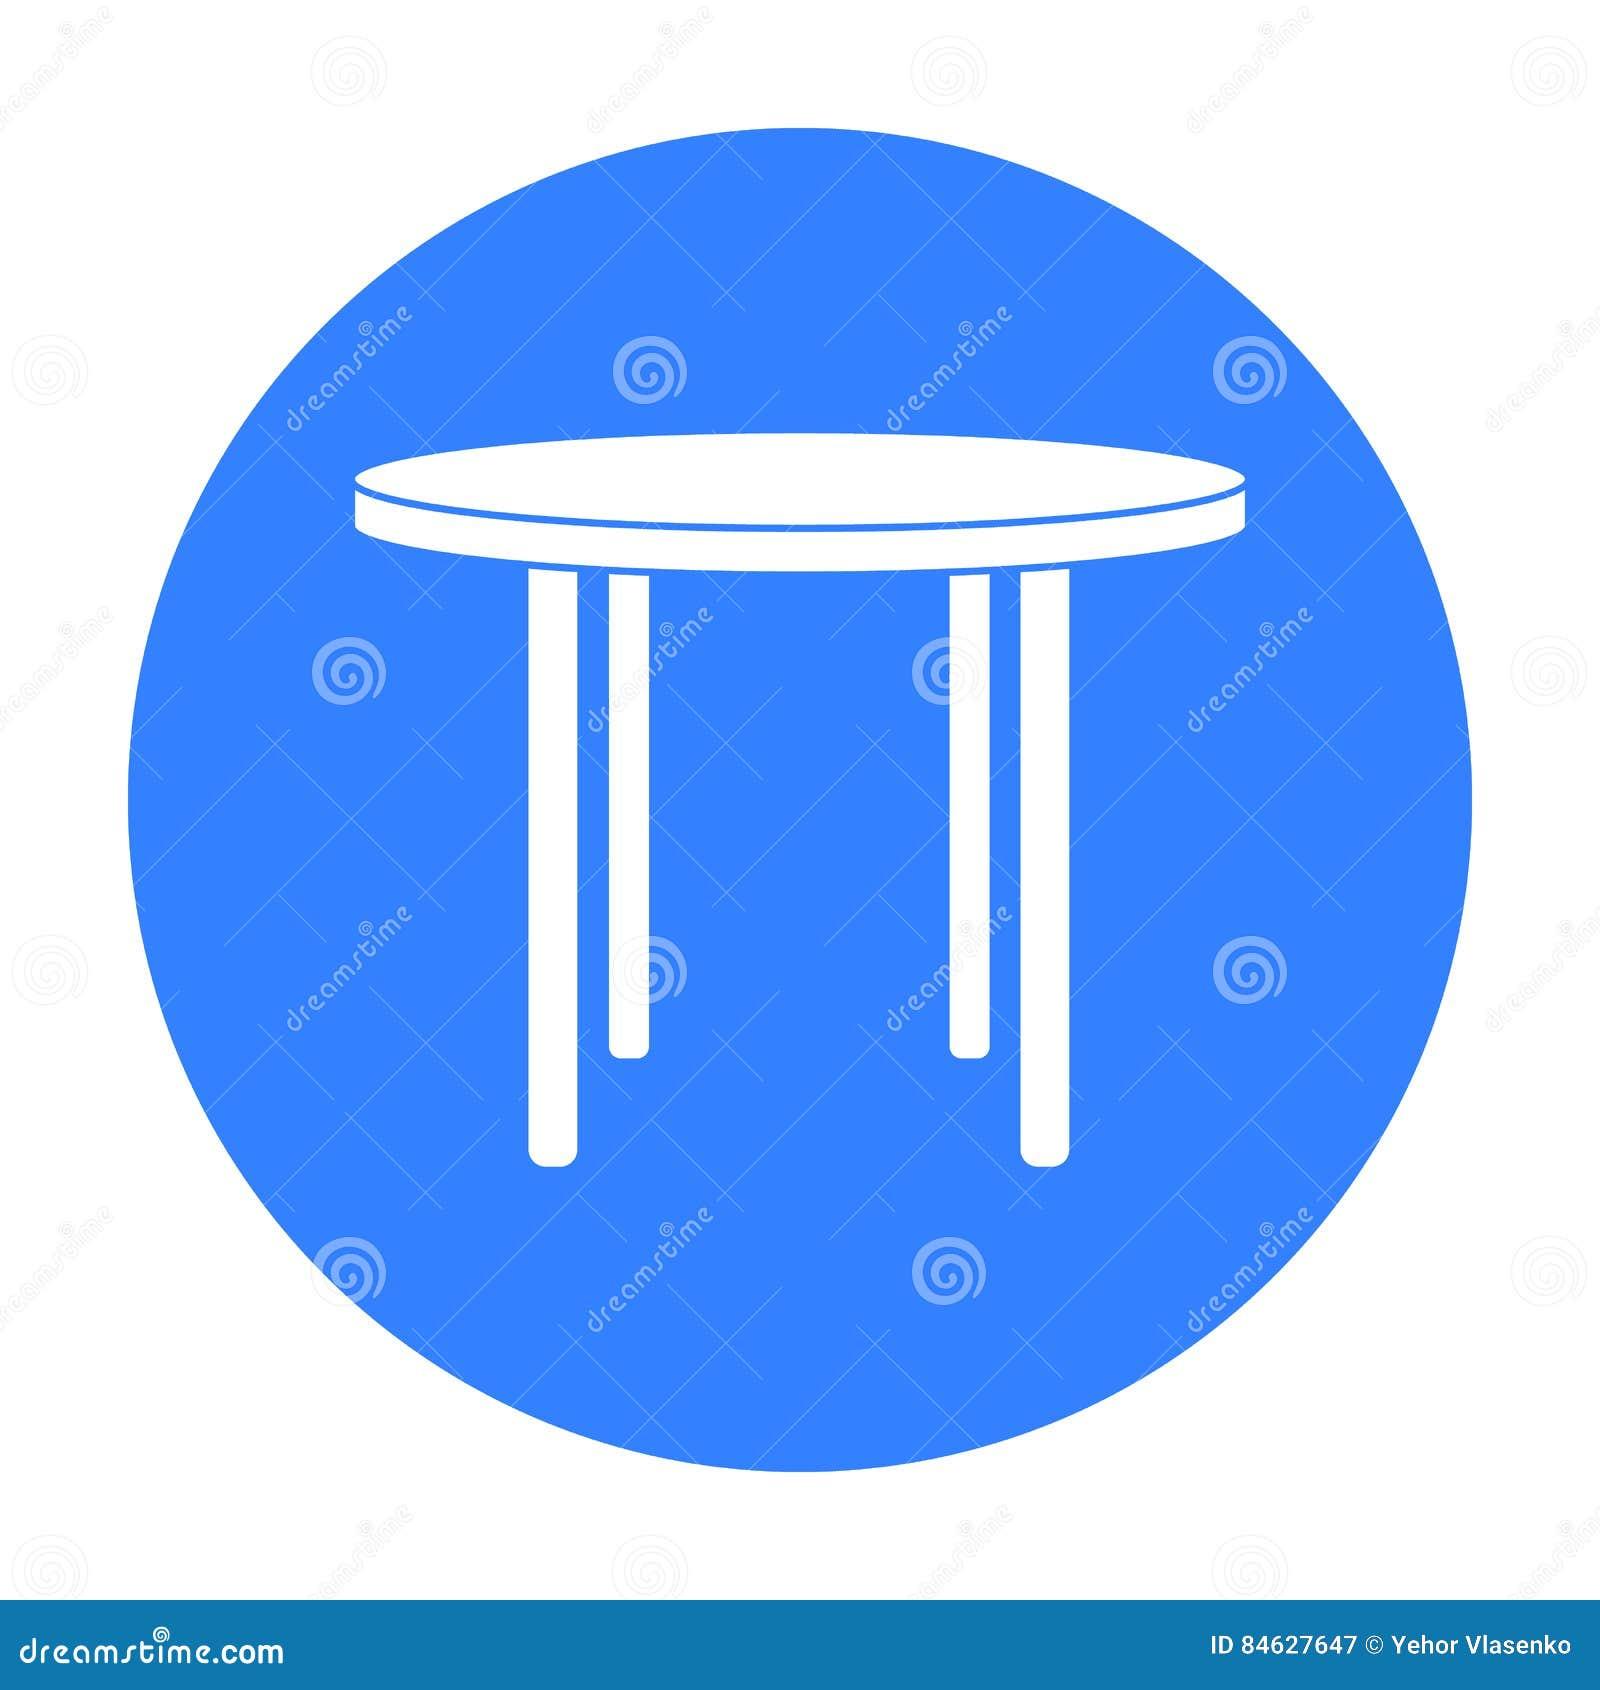 Wooden Round Table Isolated Illustration Cartoon Vector